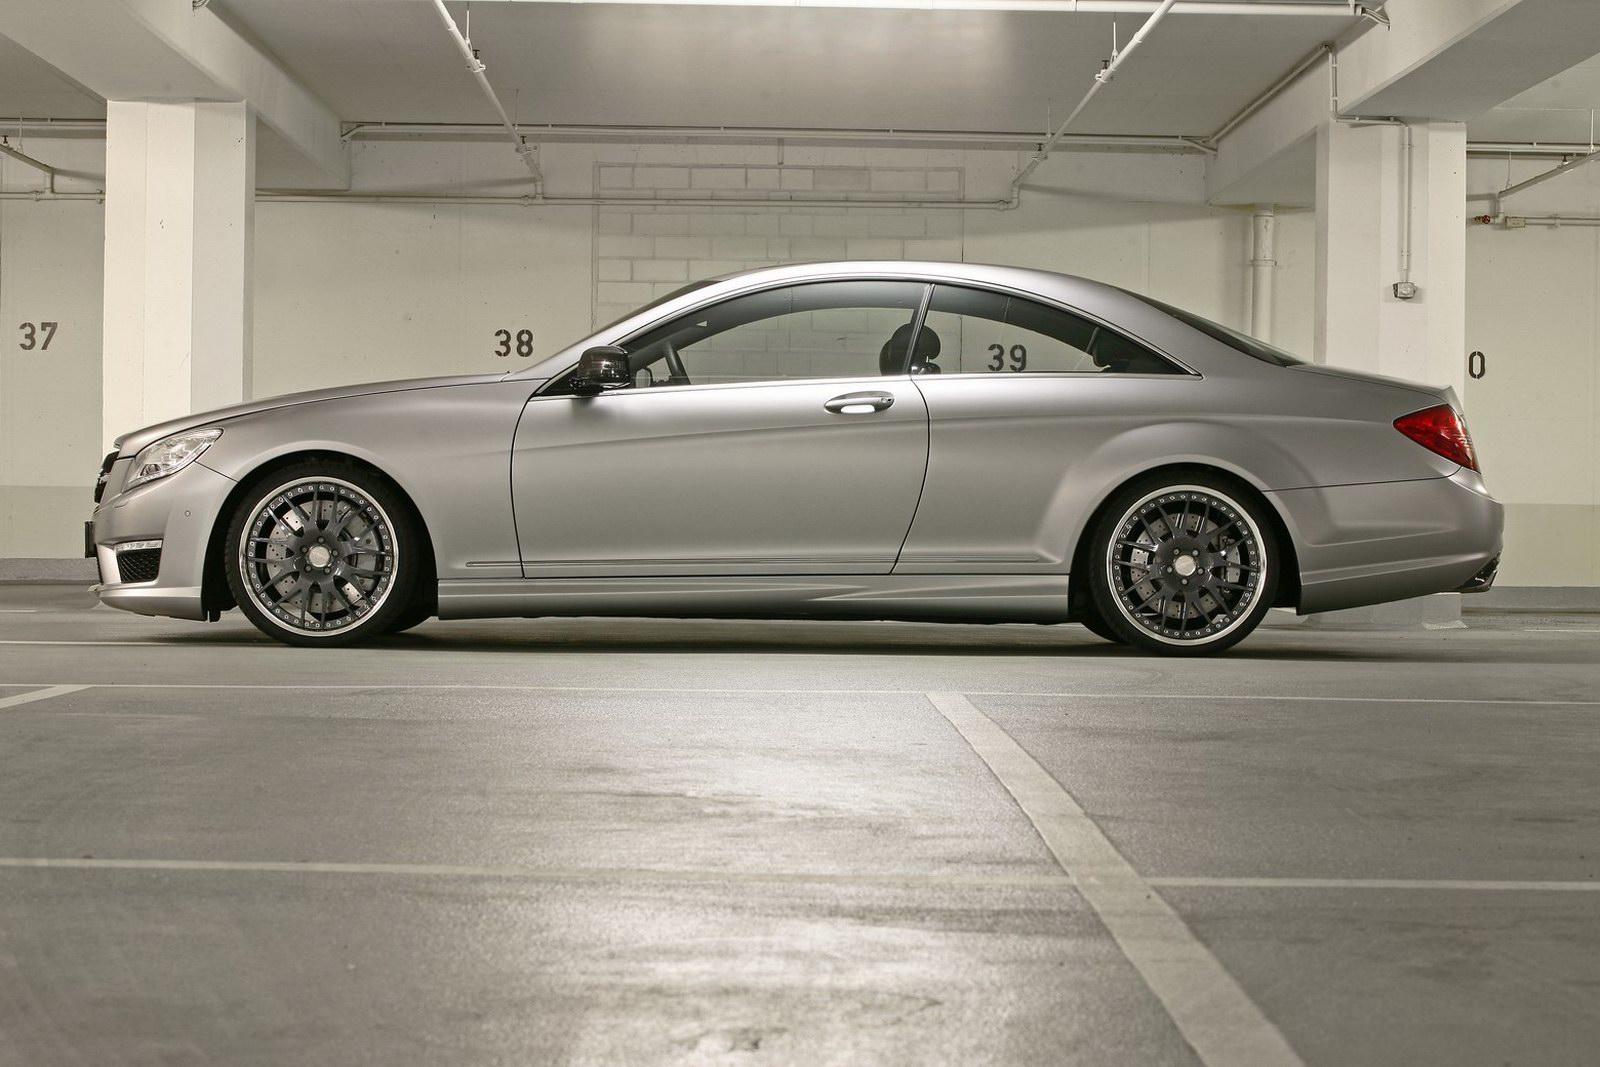 Mercedes-Bent CL 63 AMG a nárust výkonu od Väth 2